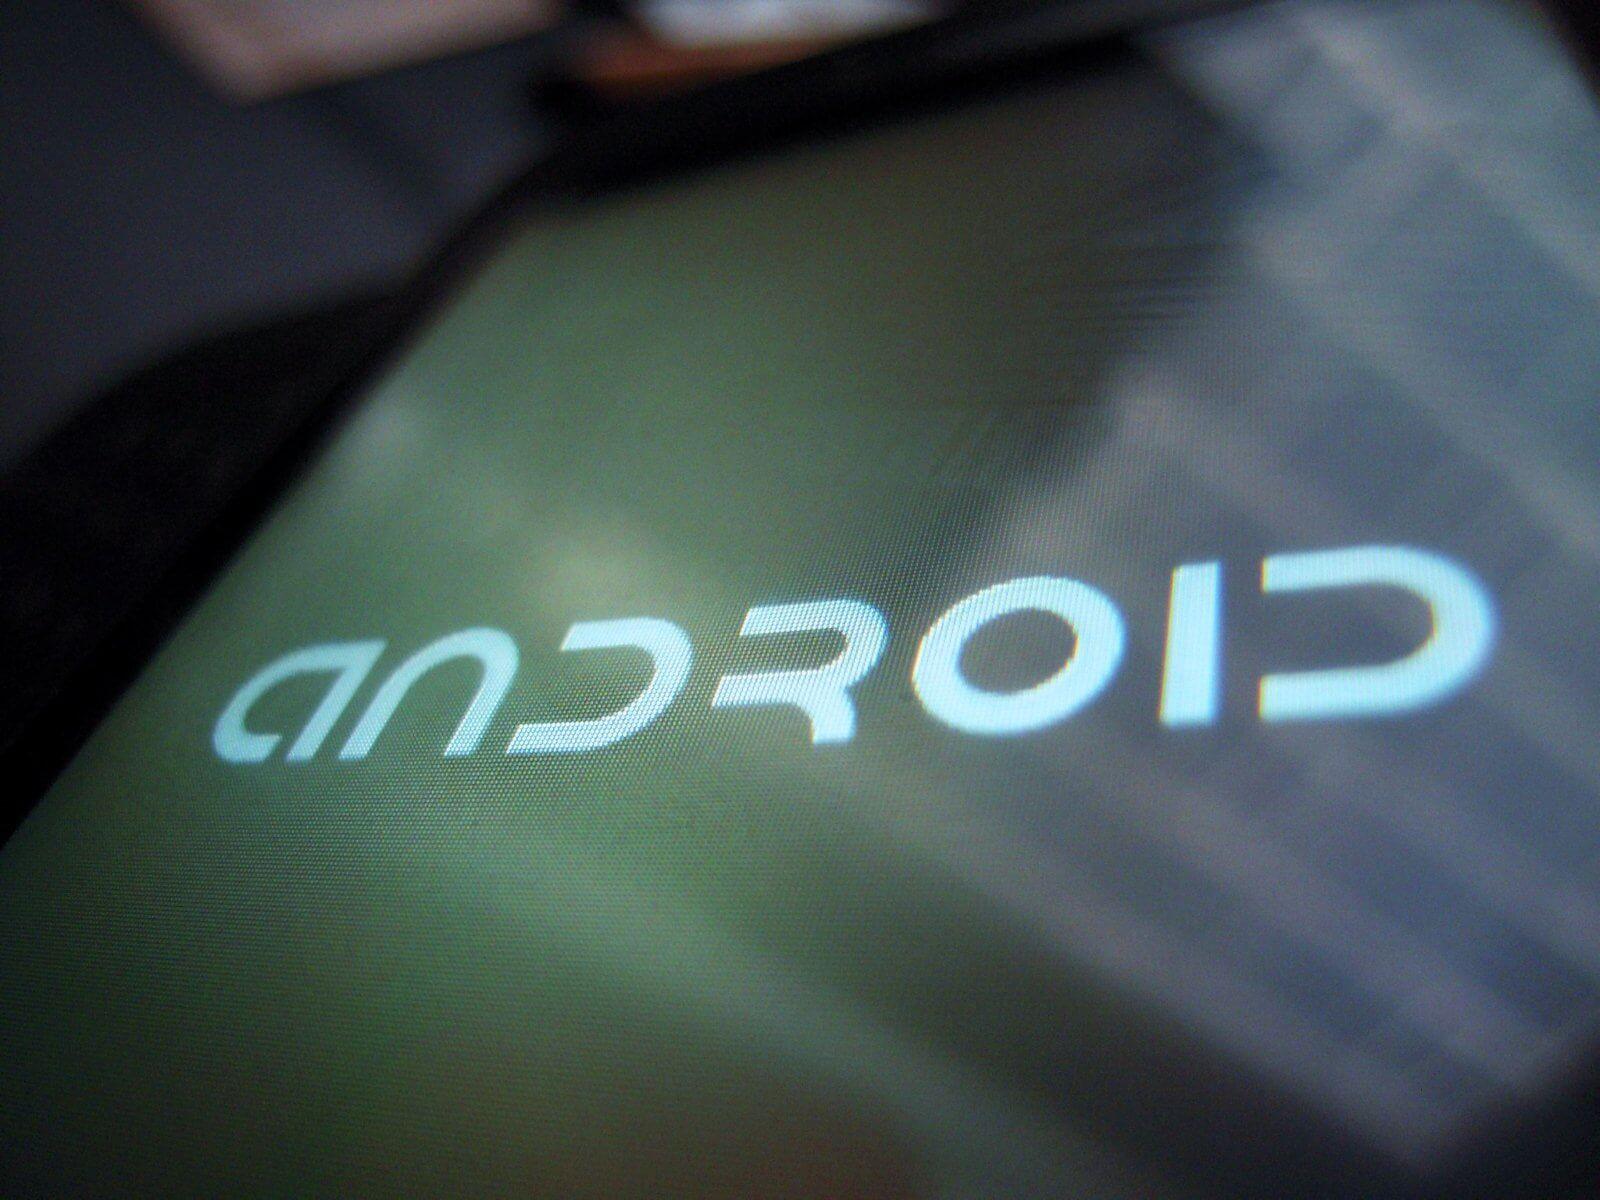 Wedowebapps Seeks New Interventions In Android App Development